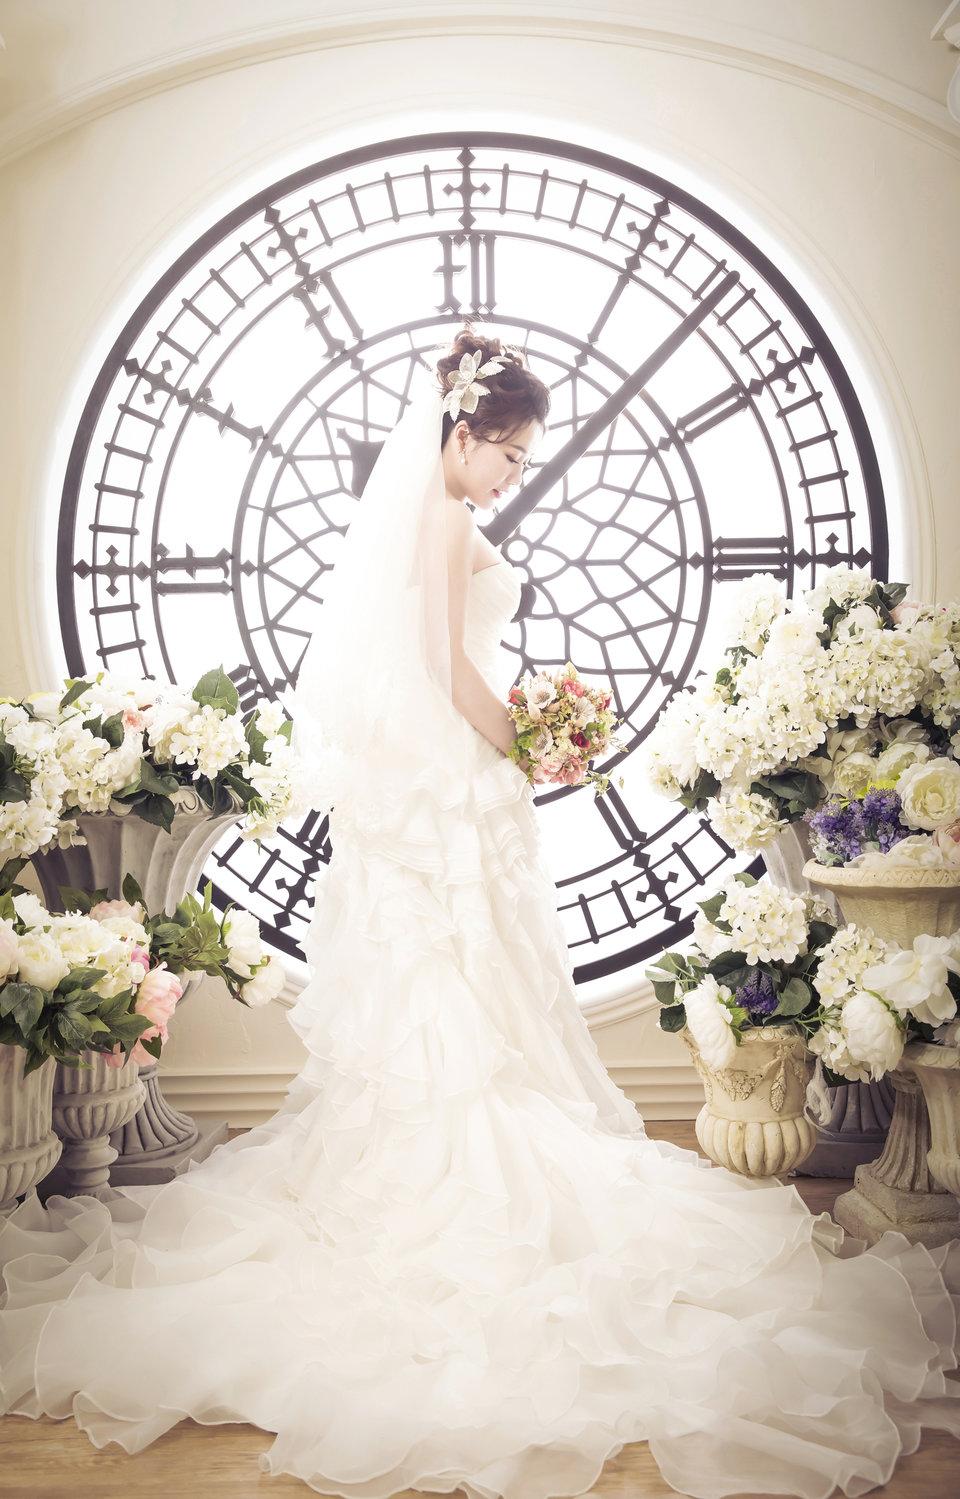 WH-為您好事韓風婚紗,【如果你只有一個月可以決定的時間,你可以看我如何推薦為你好事】